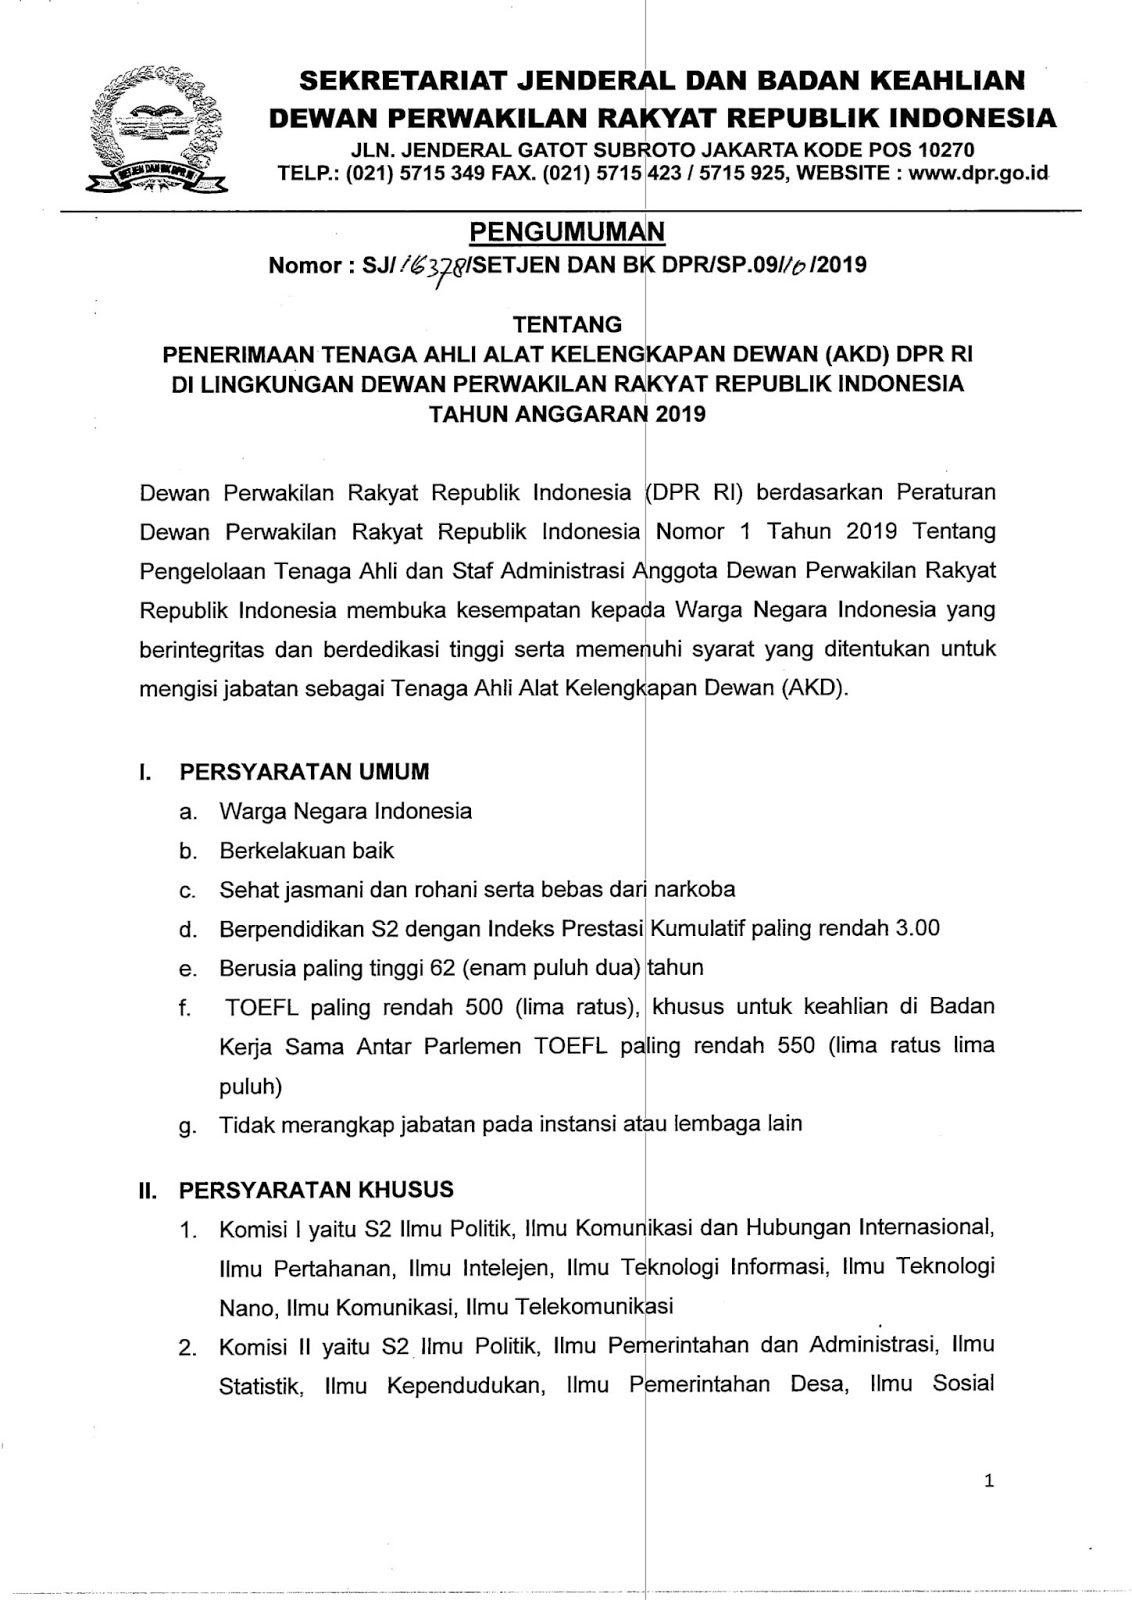 Rekrutmen Tenaga Ahli Alat Kelengkapan Dewan DPR Republik Indonesia